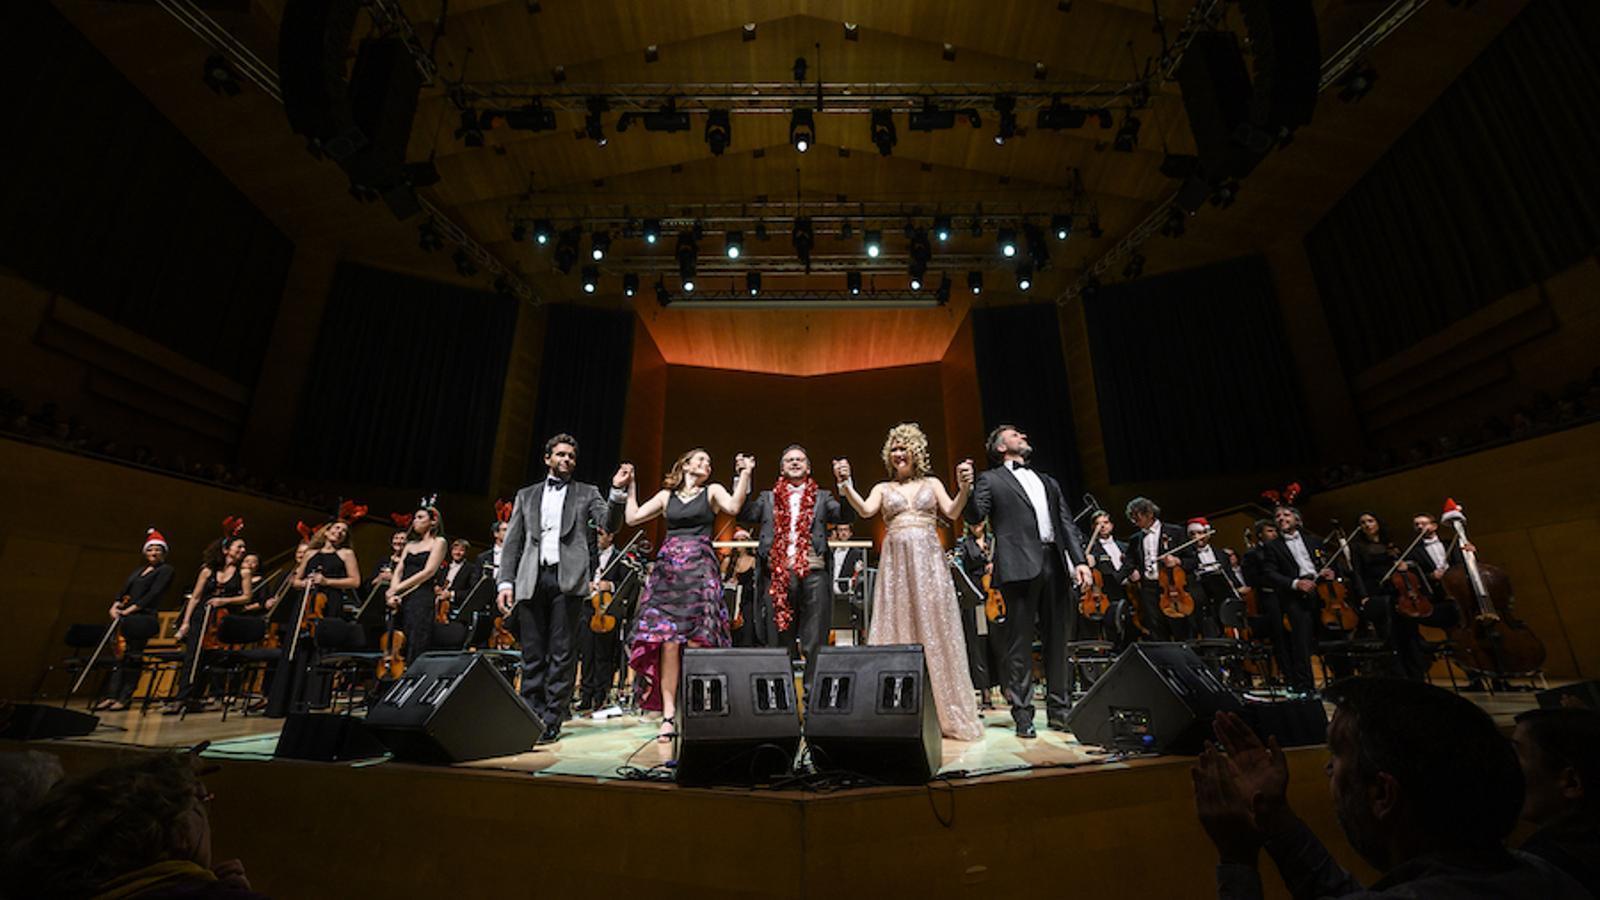 L'homenatge al Broadway de Bernstein a L'Auditori / MAY ZIRCUS / L'AUDITORI